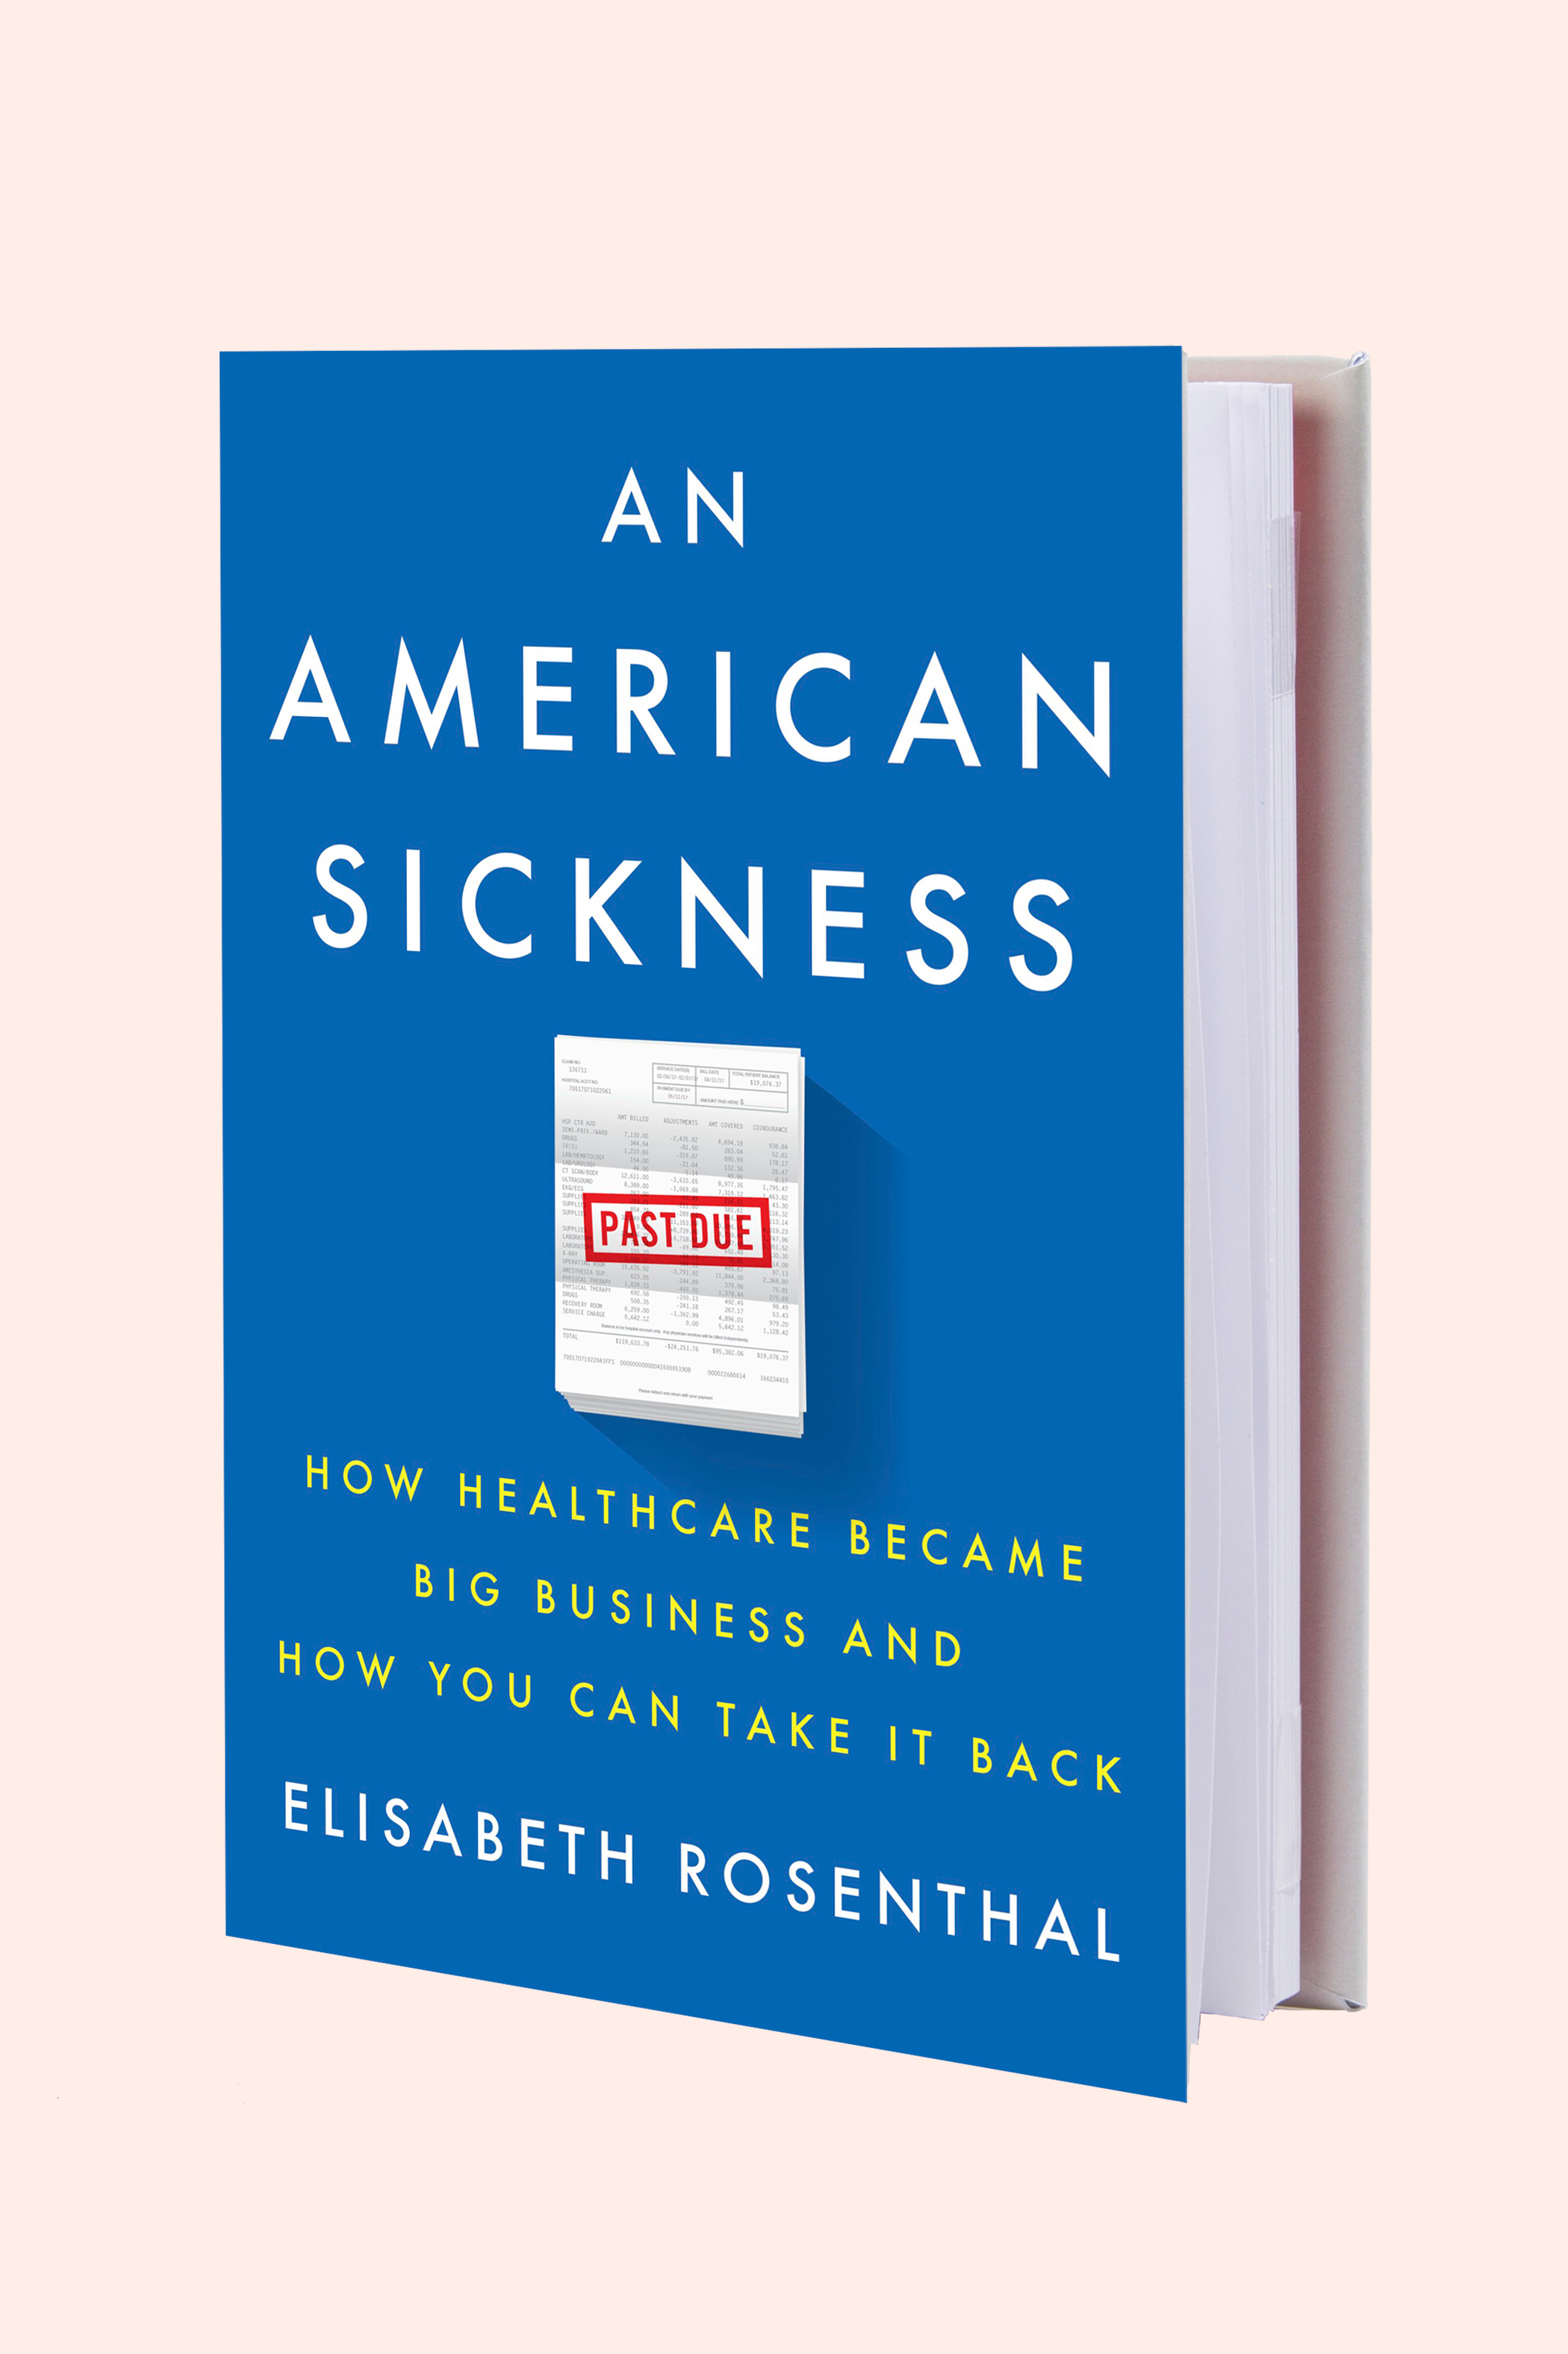 170502-an-american-sickness